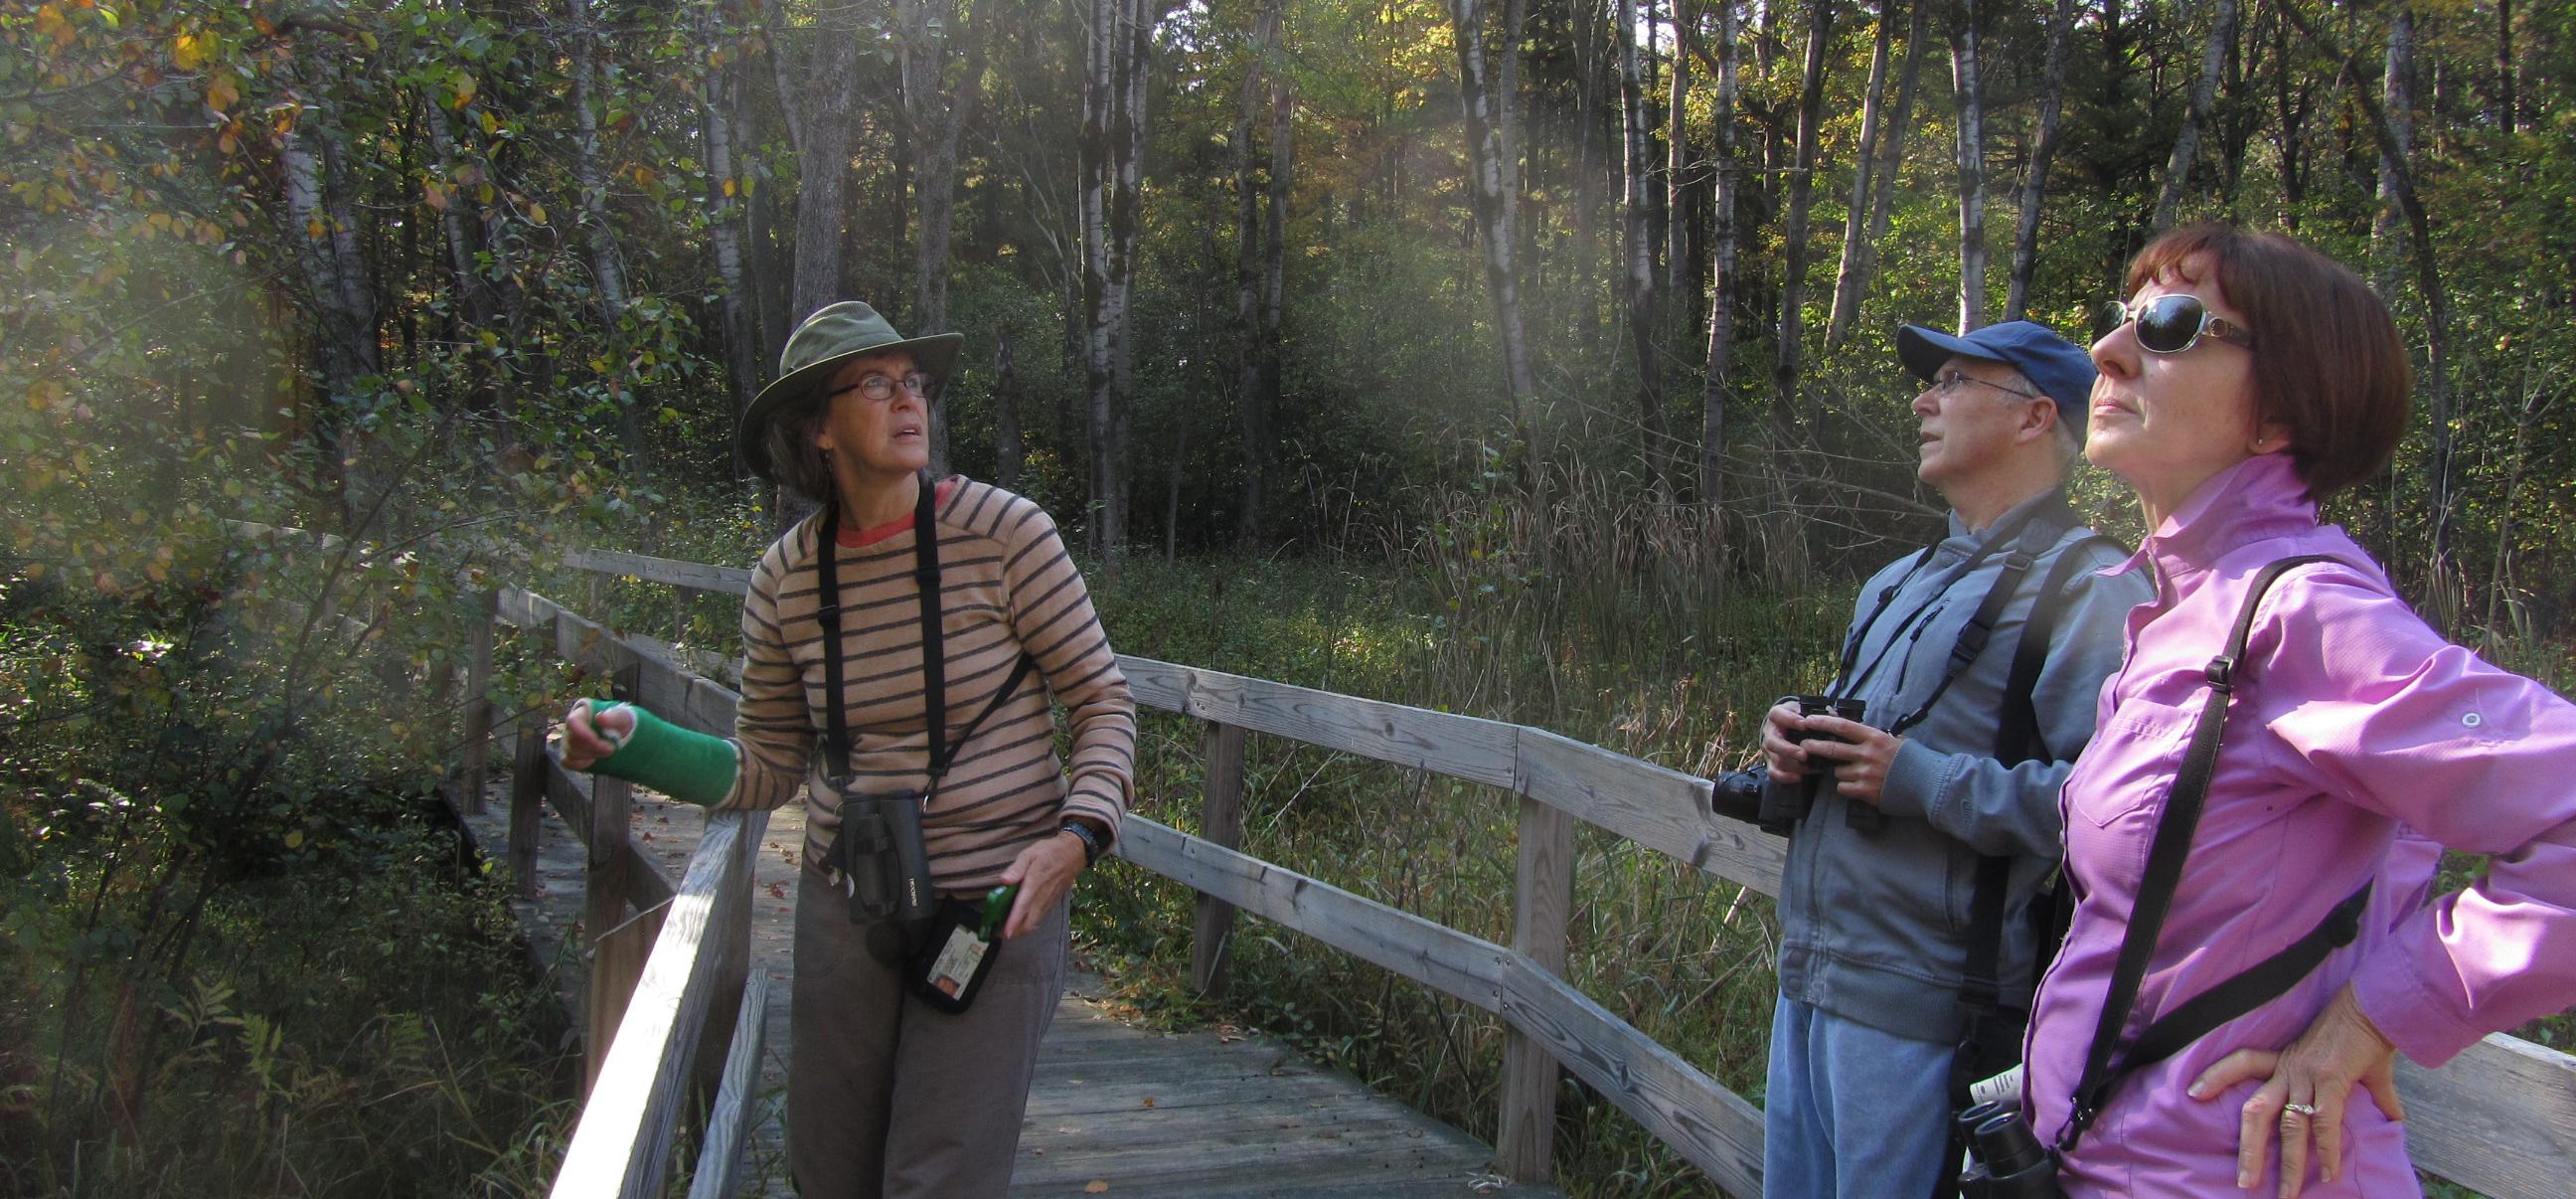 Susan and fellow birders at Bluegill Bay Park.